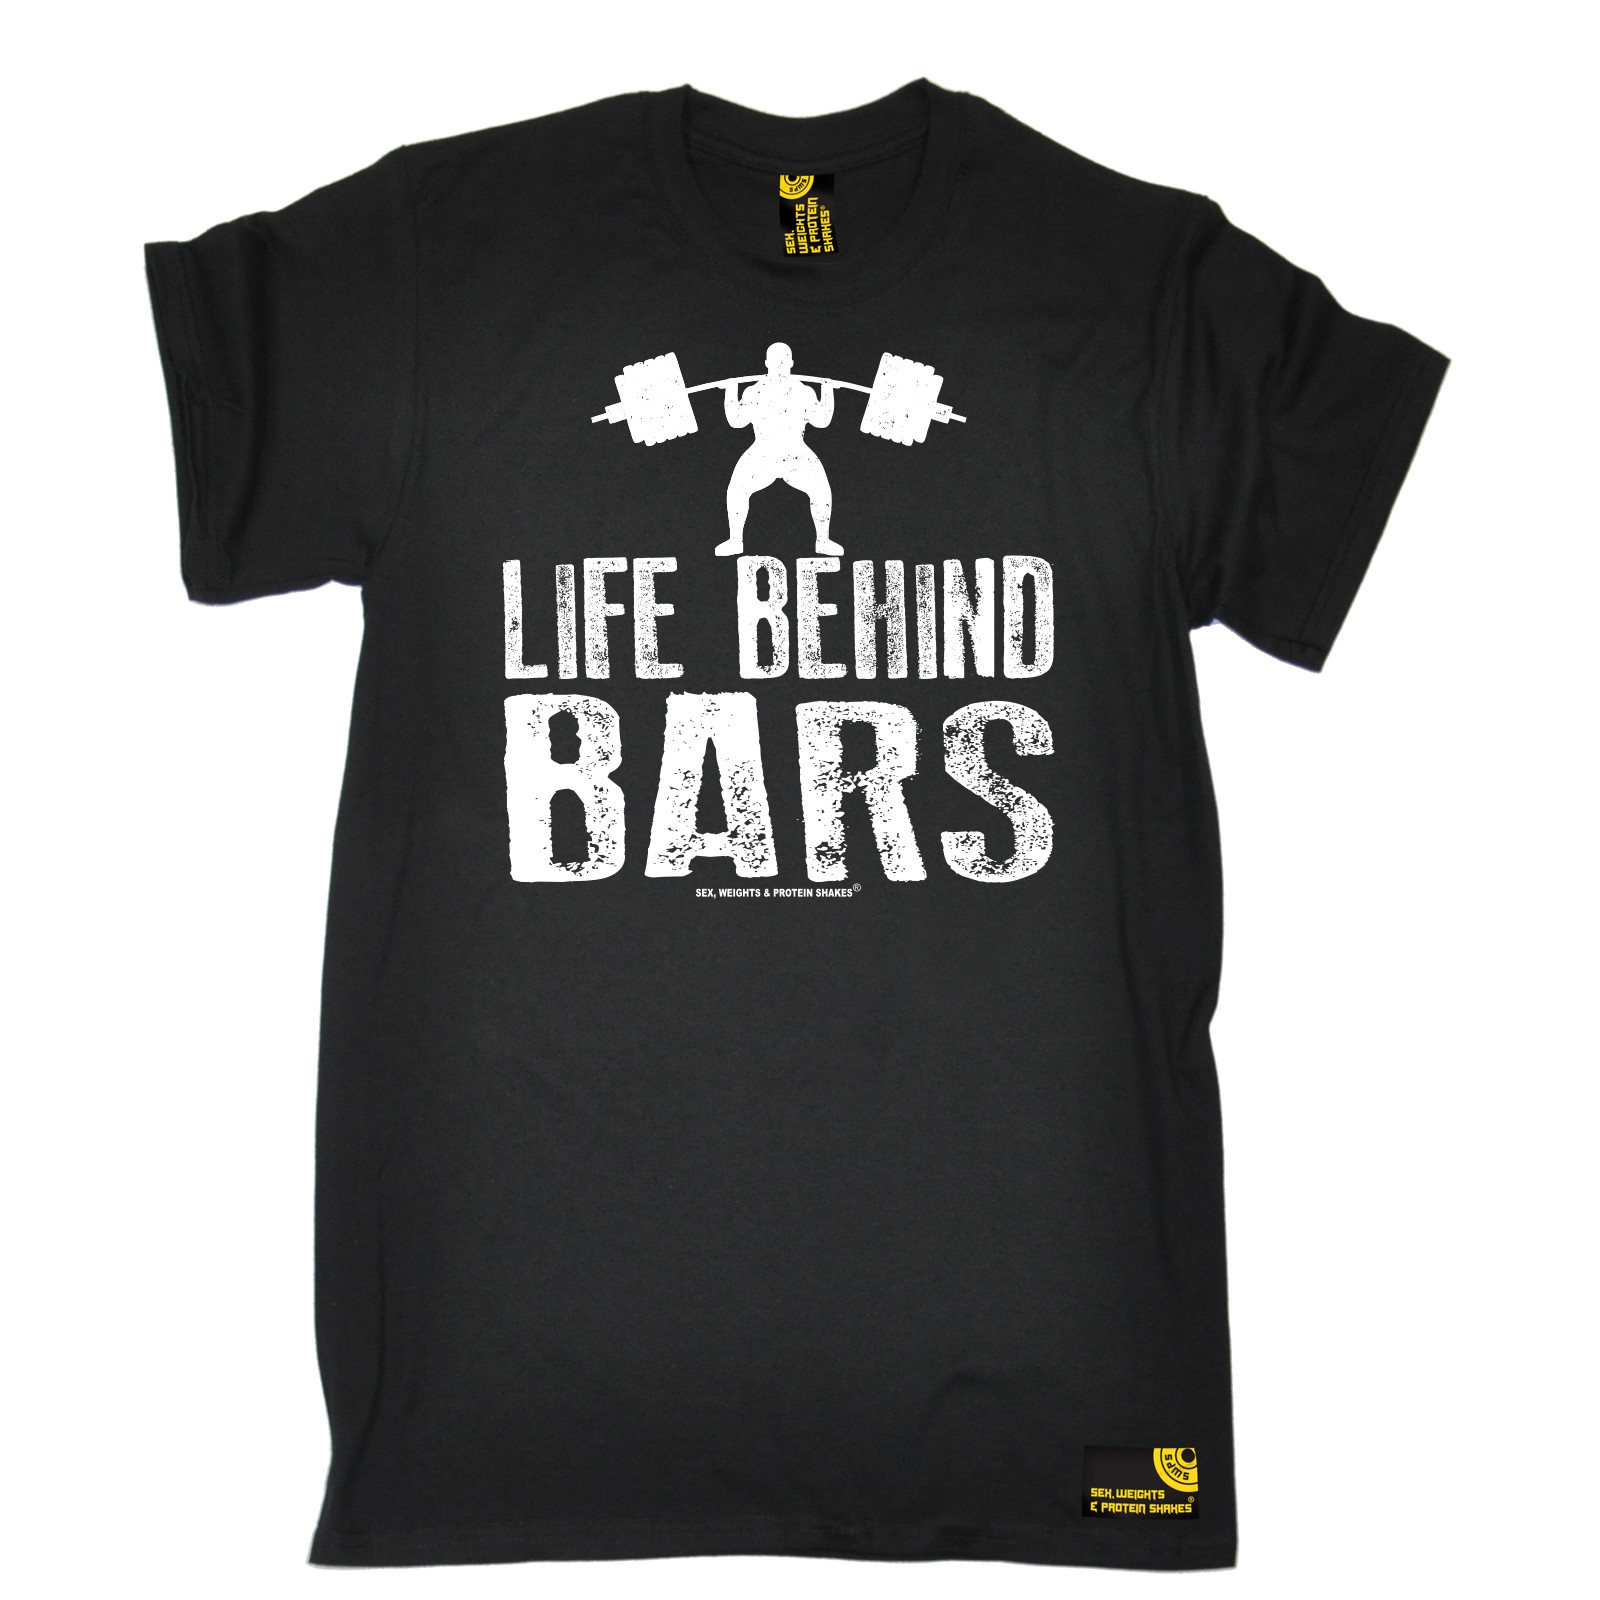 350d5e2e5 Life Behind Bars Weight Lifting T-shirt Tee Bodybuilding Funny Birthday  Gift Men Cotton T-Shirt Printed T Shirt